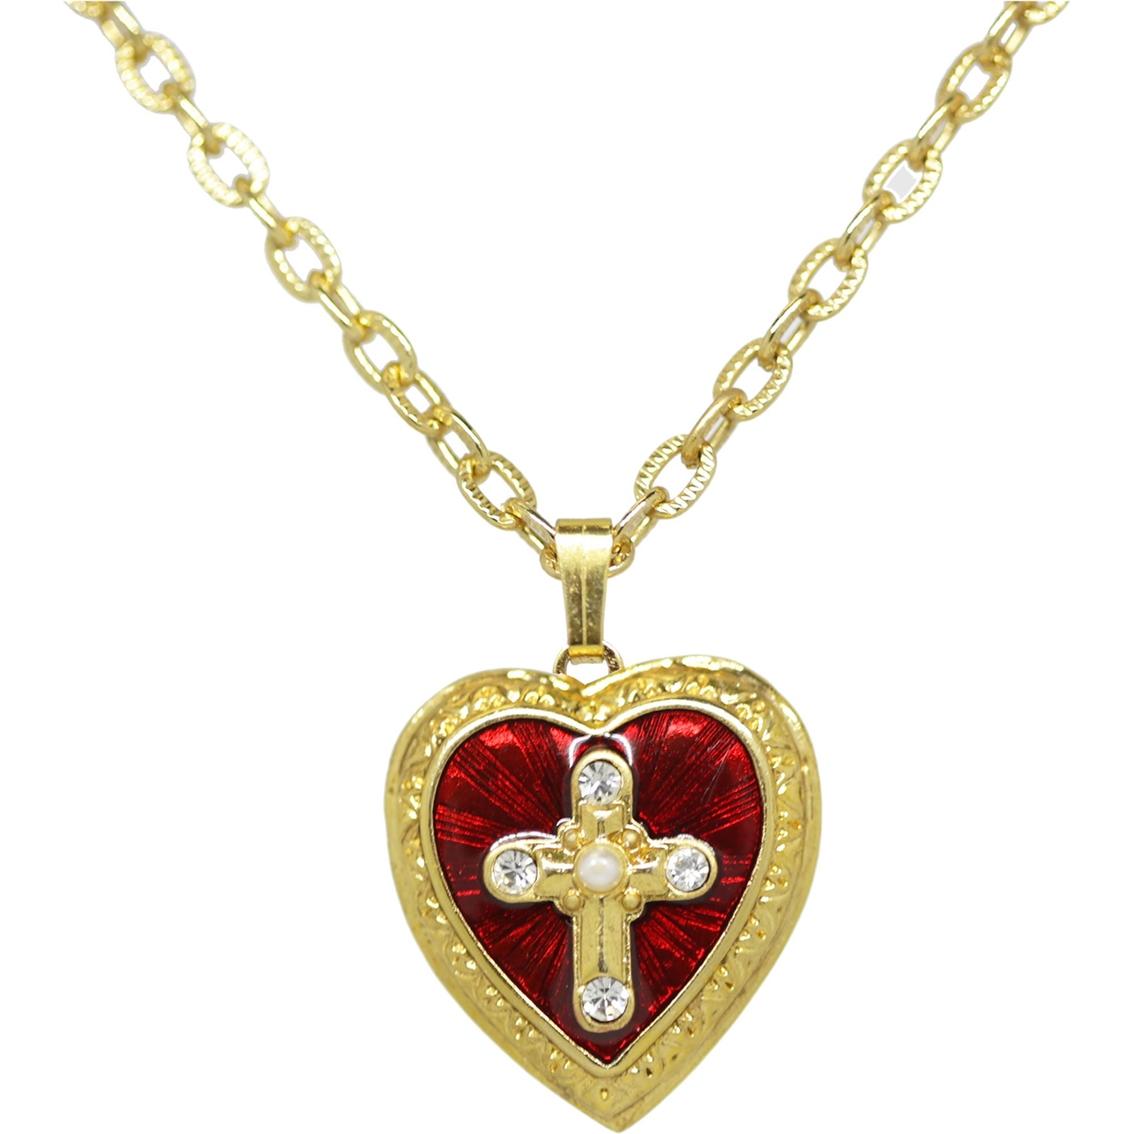 Symbols Of Faith 14k Goldtone Red Enamel Cross Of Glory Heart Locket